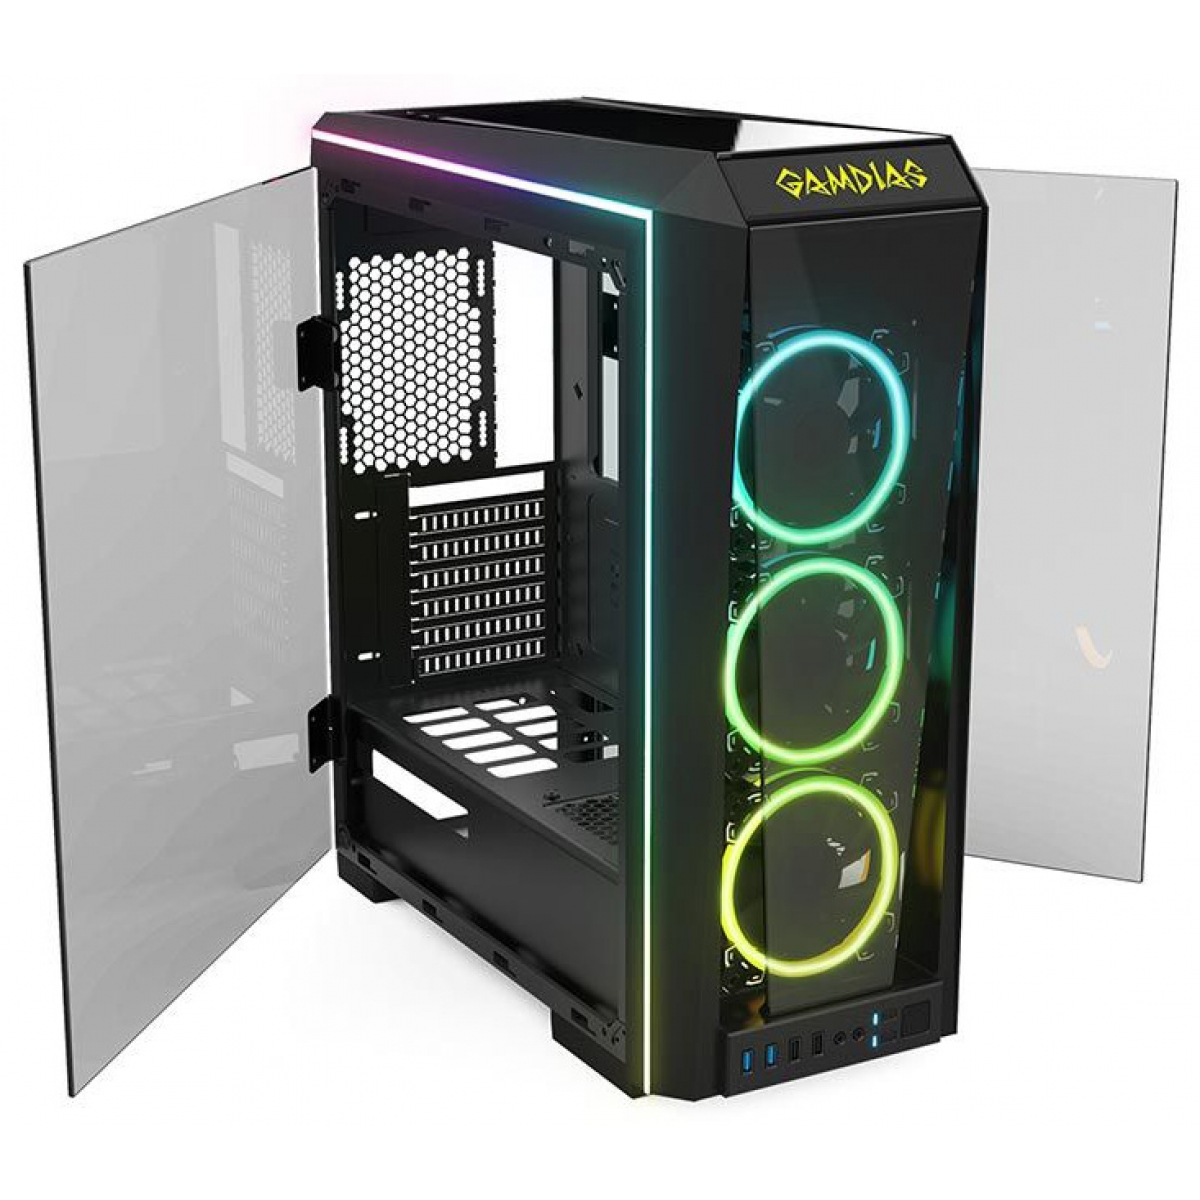 Gabinete Gamer Gamdias Talos P1, Mid Tower, Com 3 Fans RGB, Vidro Temperado, Black, S-fonte